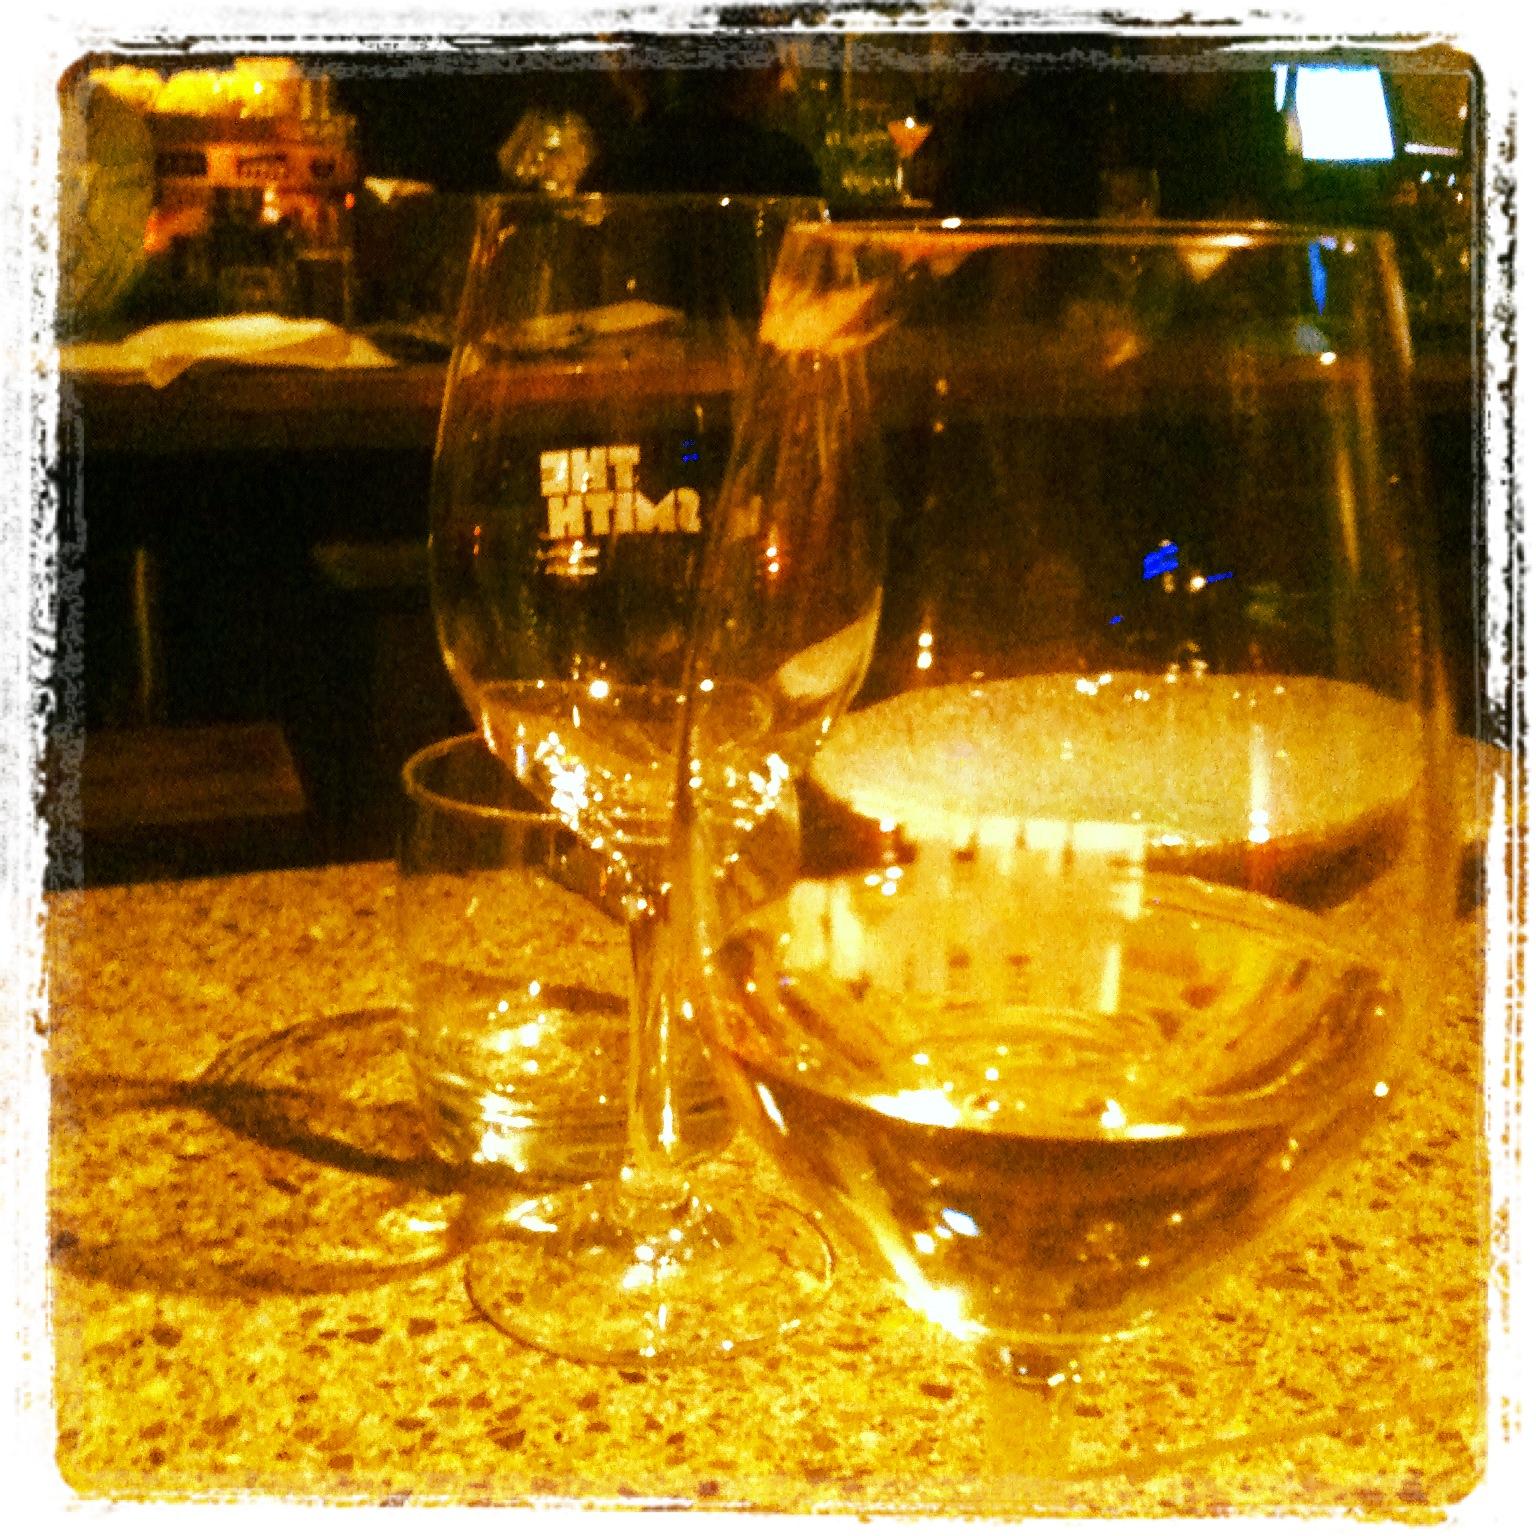 My wine of choice - chardonnay.